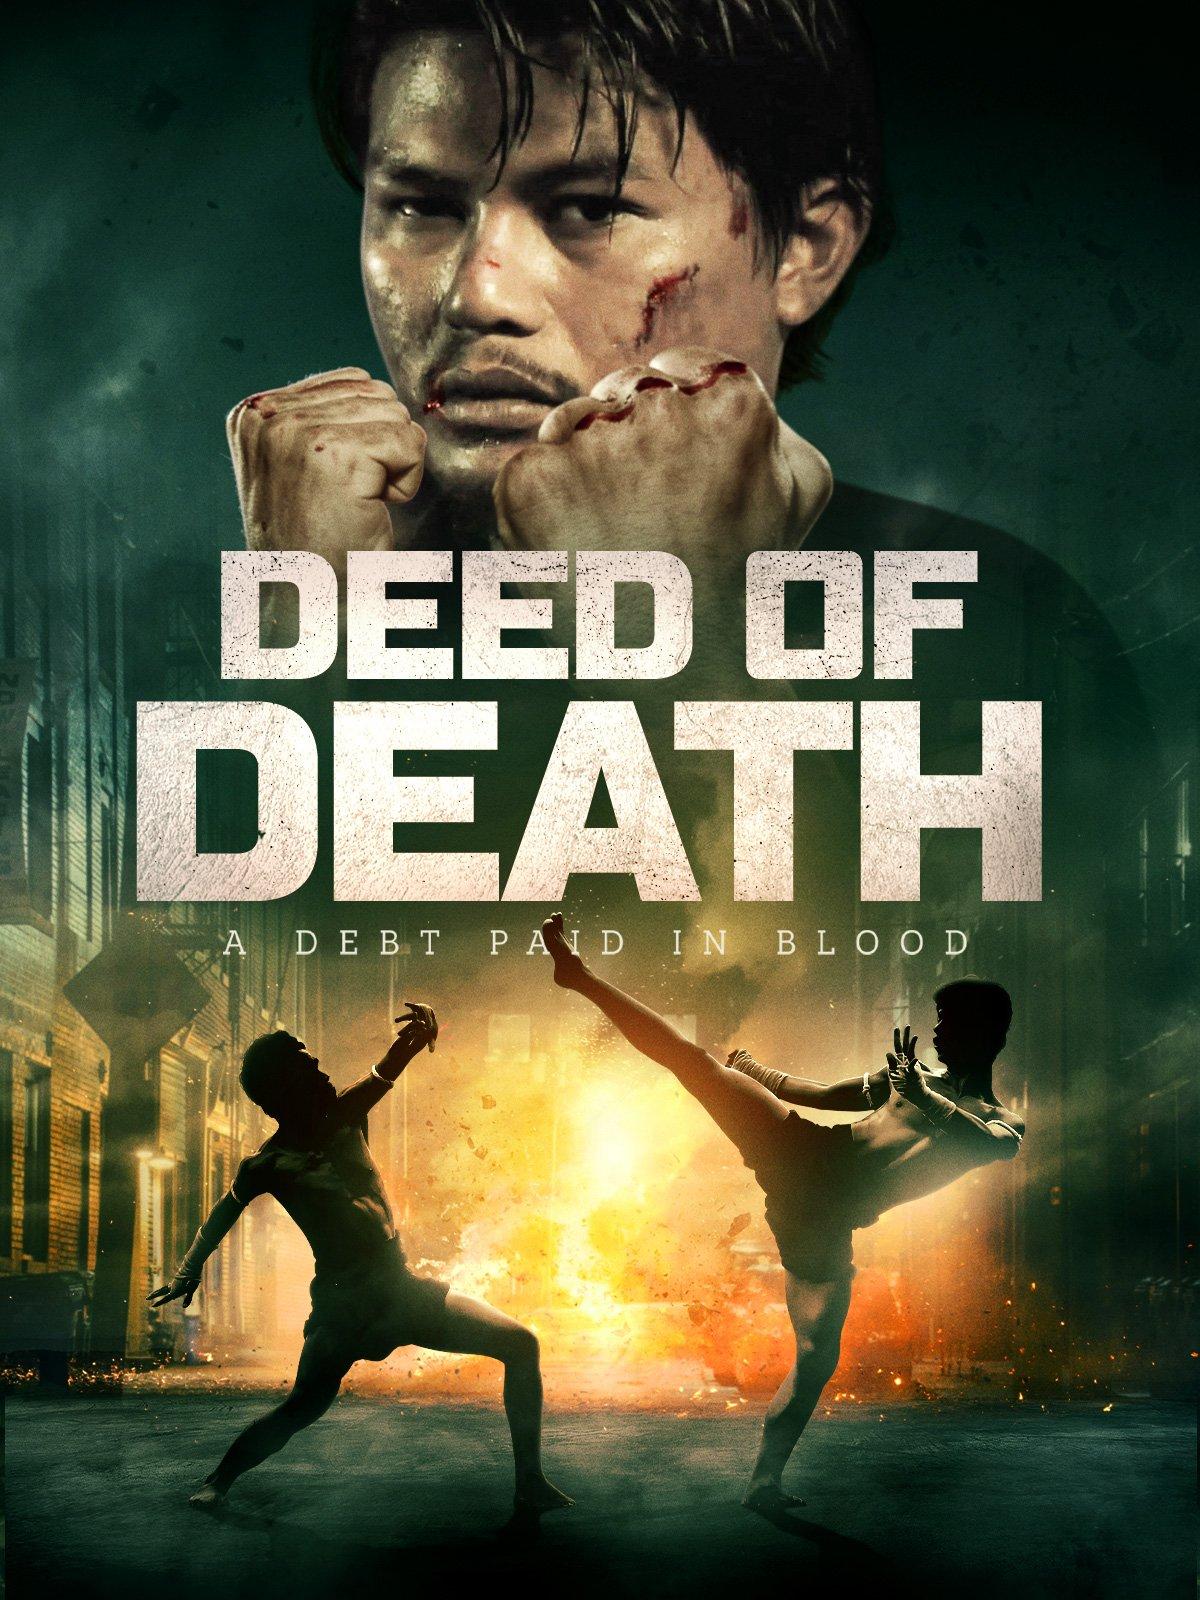 Deed of Death (Signature Entertainment) Artwork